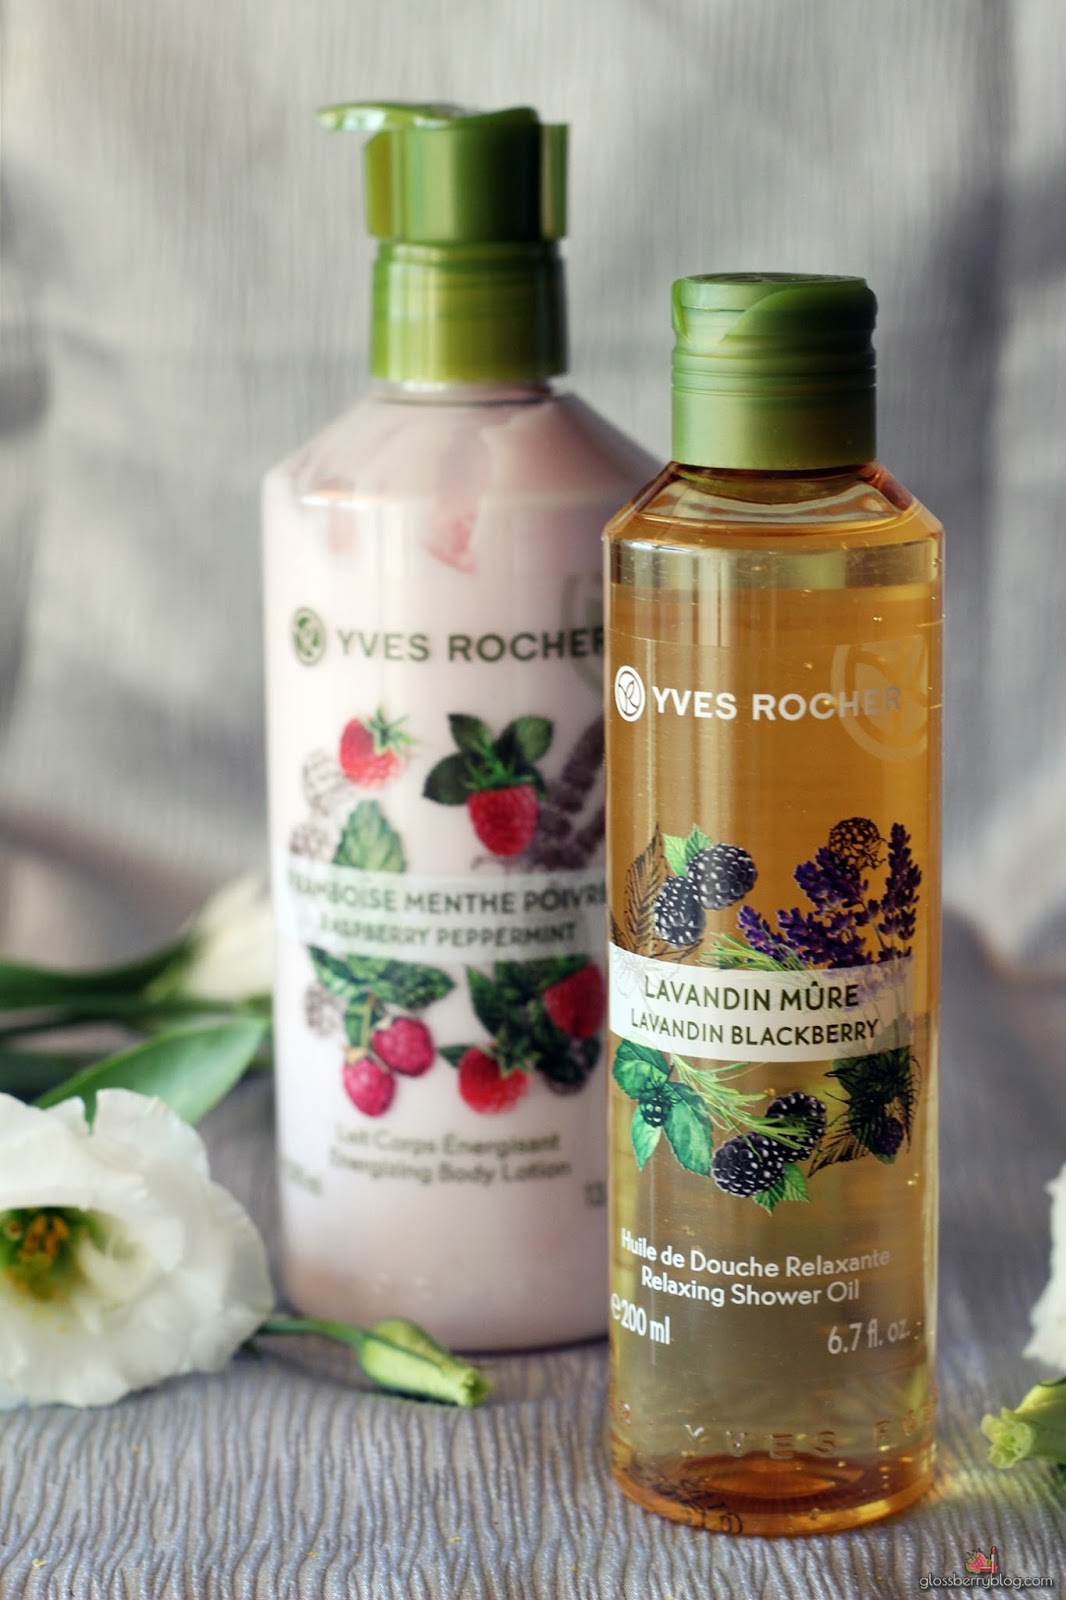 Yves Rocher - Plaisires Nature איב רושה סדרה חדשה עינוגי עונג הטבע גלוסברי